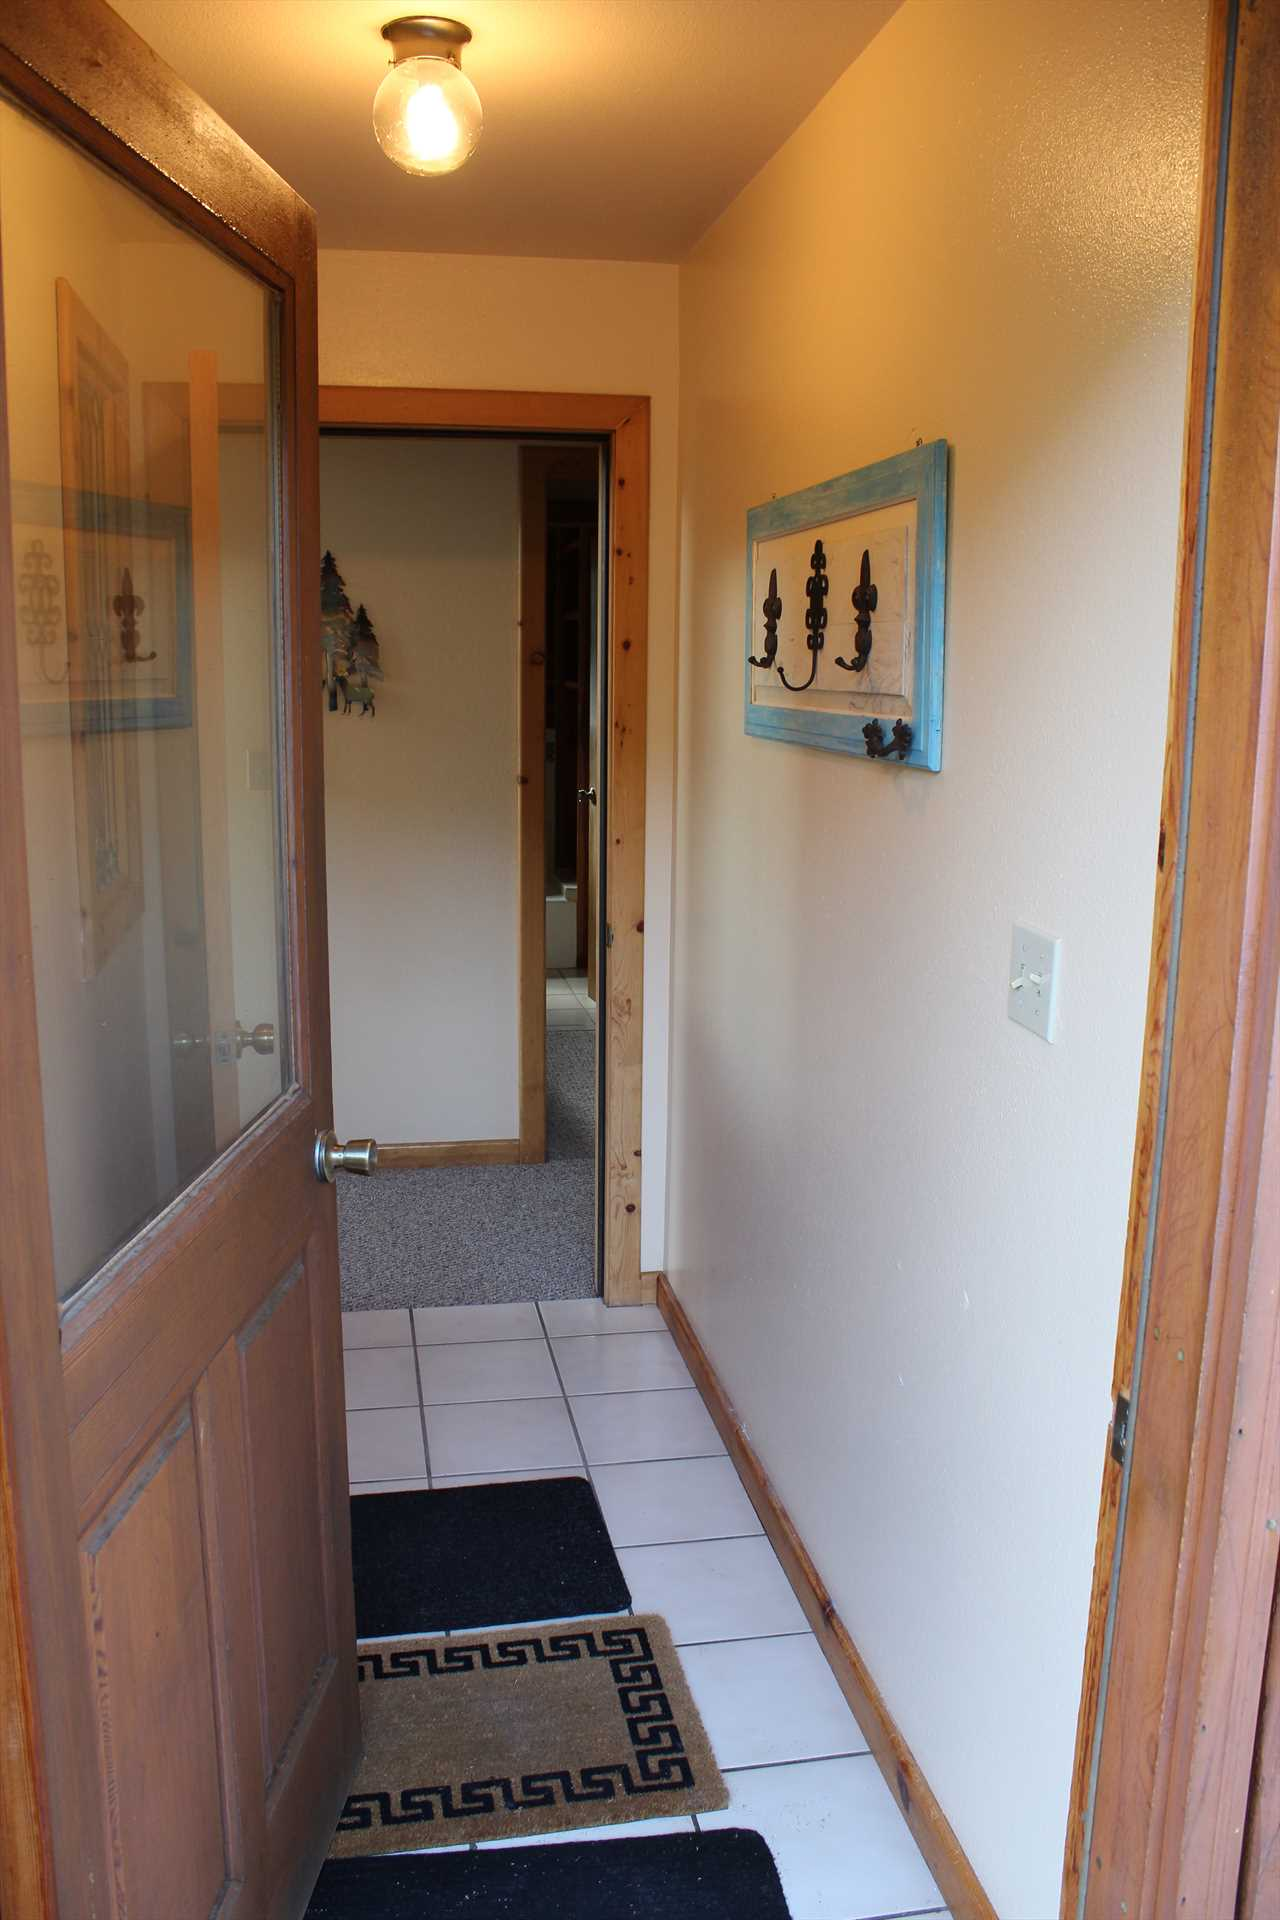 Entry Way from Front Door